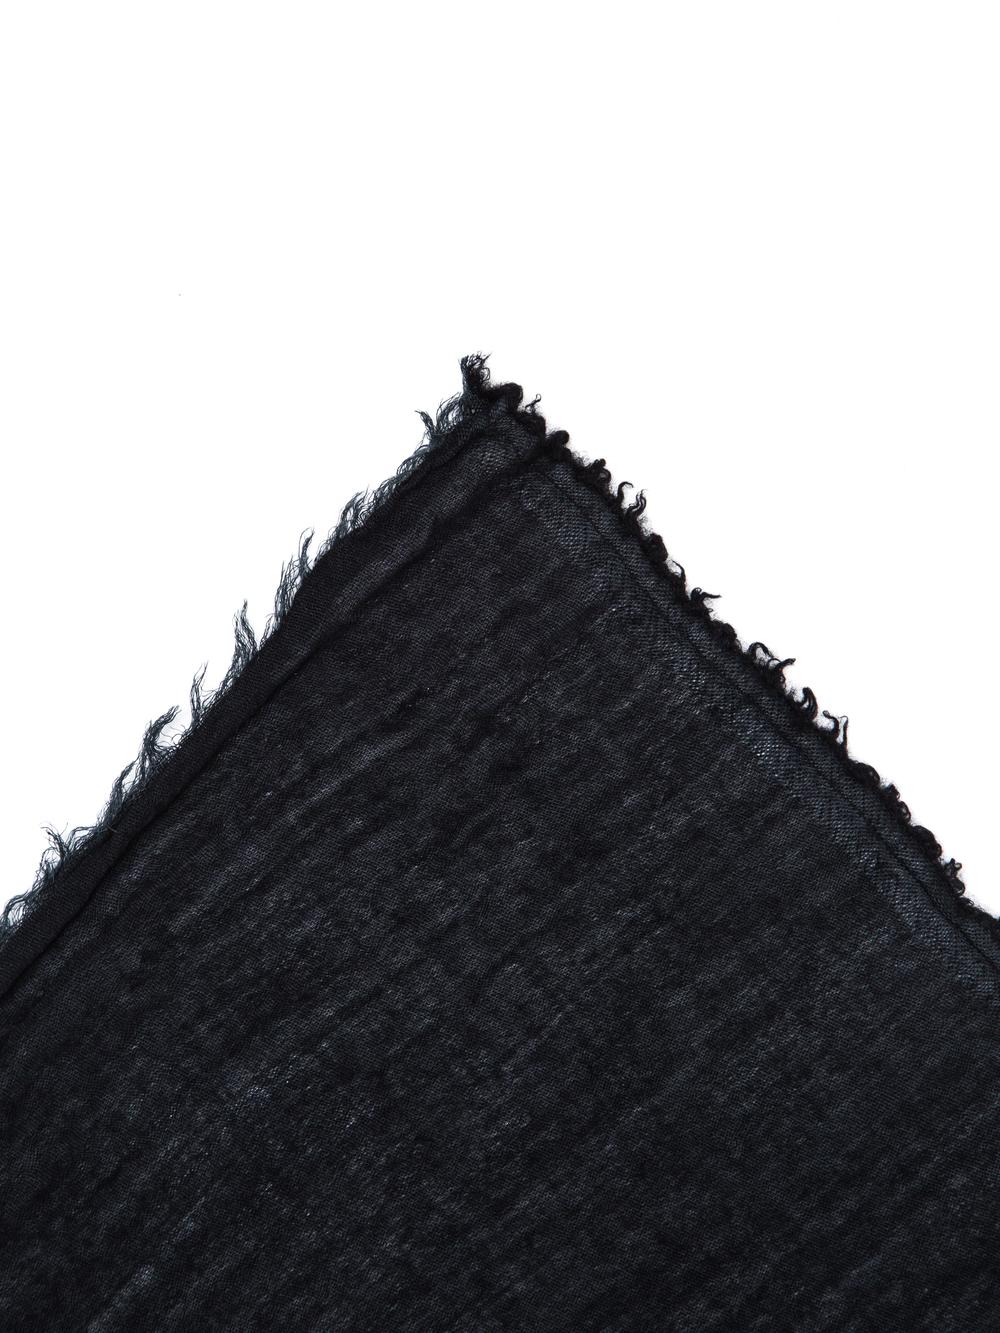 RICK OWENS FOULARD IN BLACK WASHED COTTON